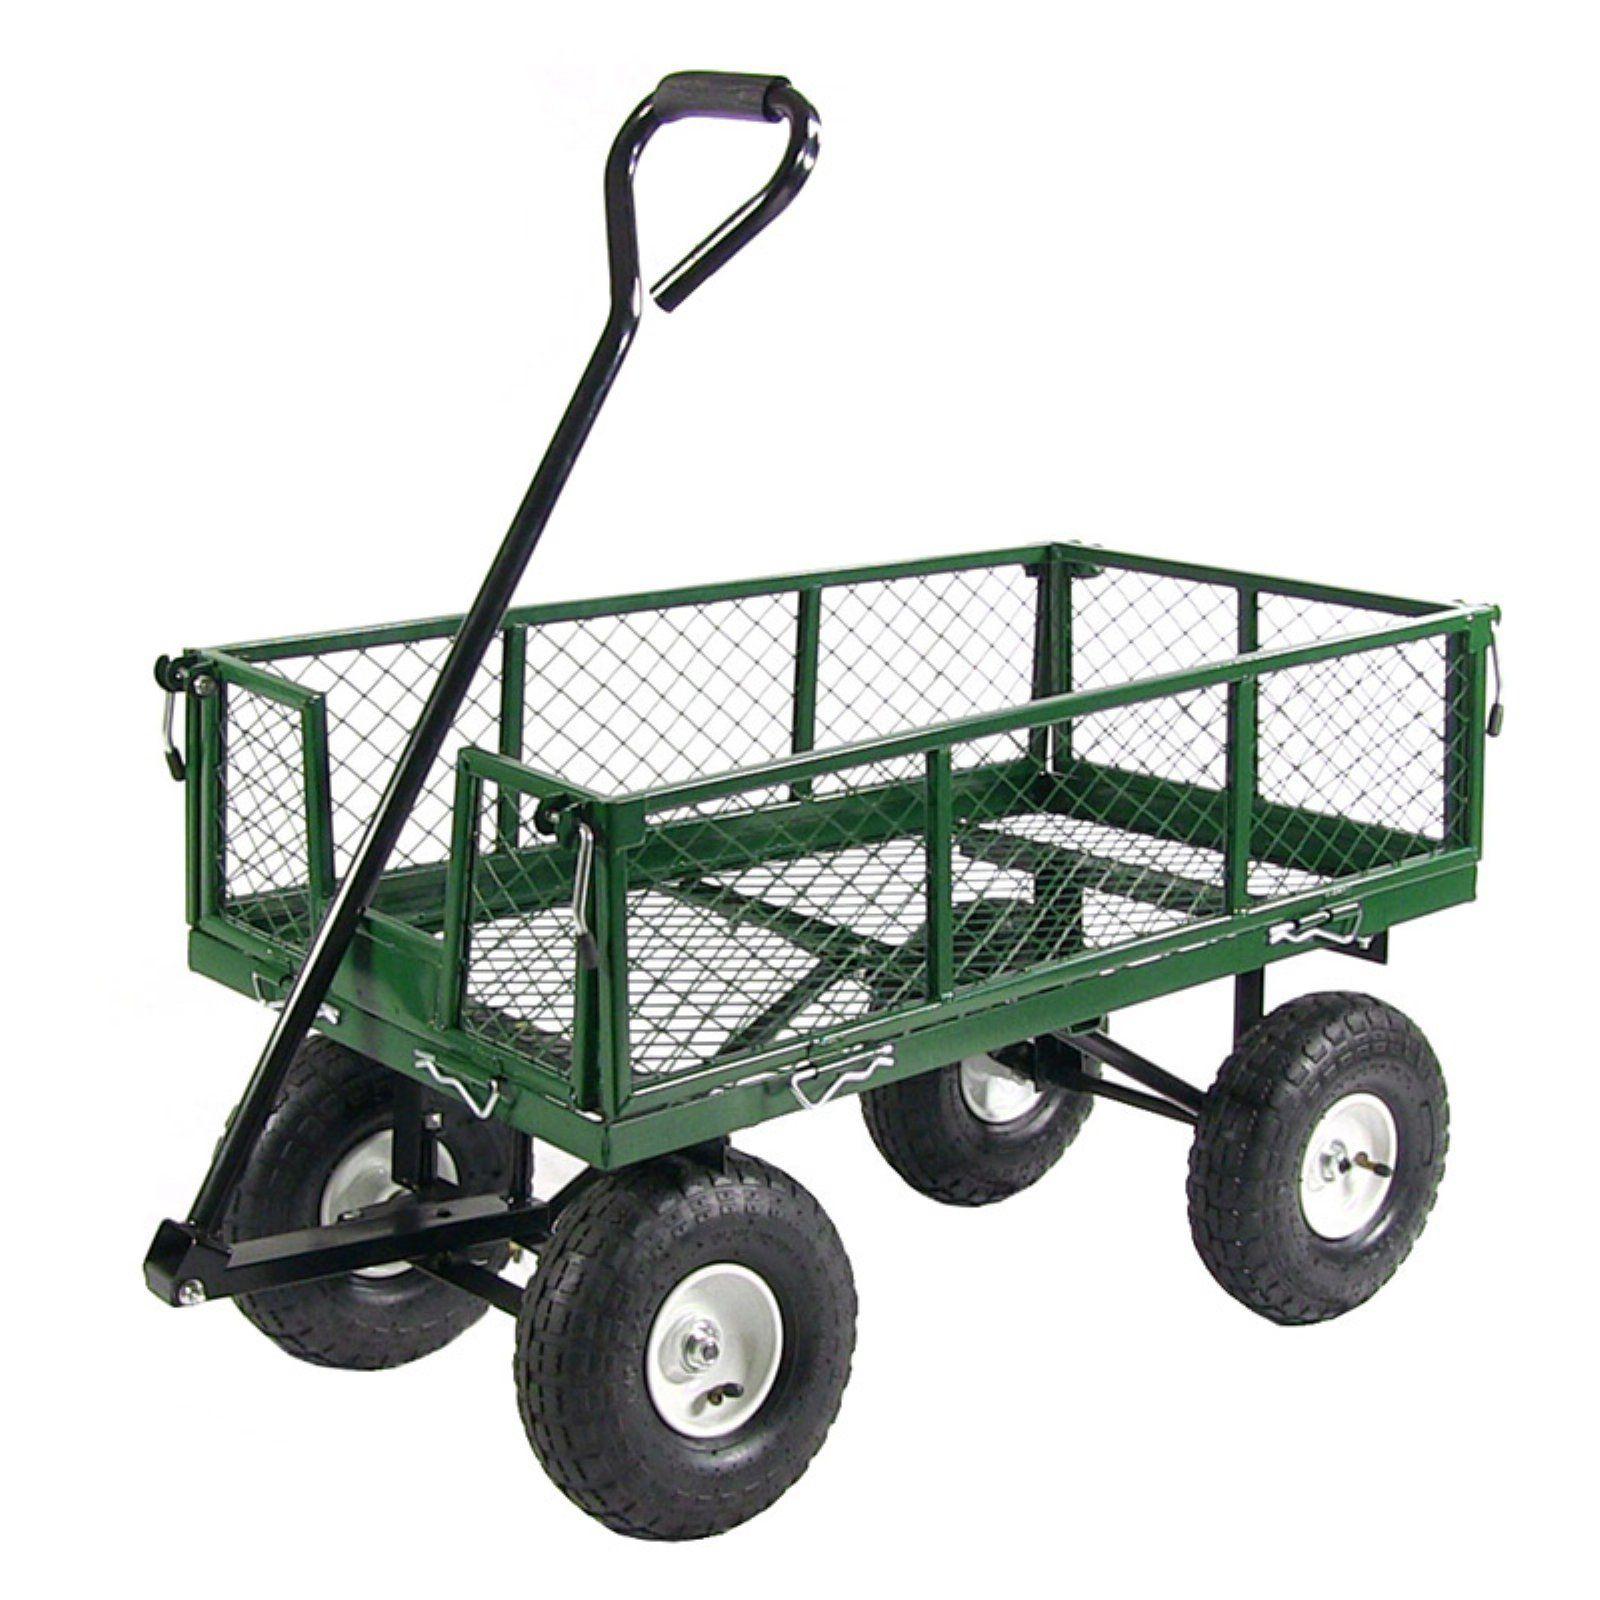 Sunnydaze Decor Steel Utility Cart with Removable Folding Sides